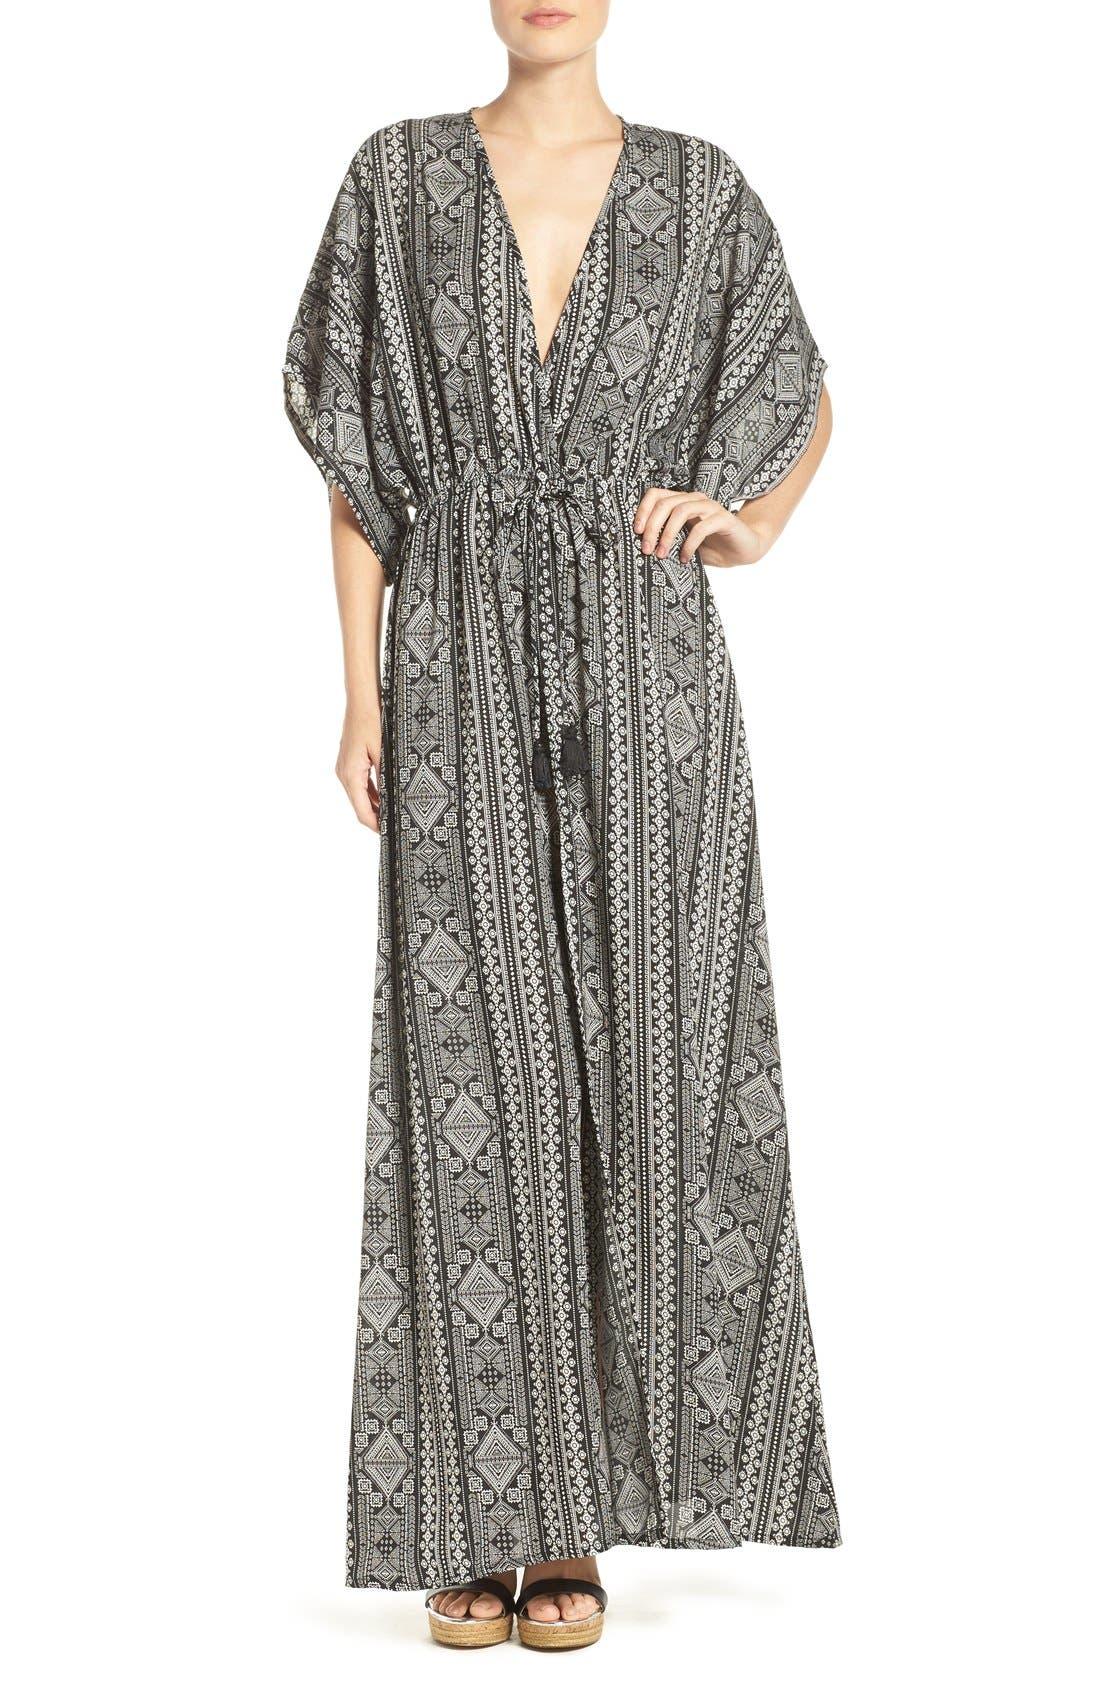 Alternate Image 1 Selected - ElanPrint Woven Cover-Up Caftan Maxi Dress